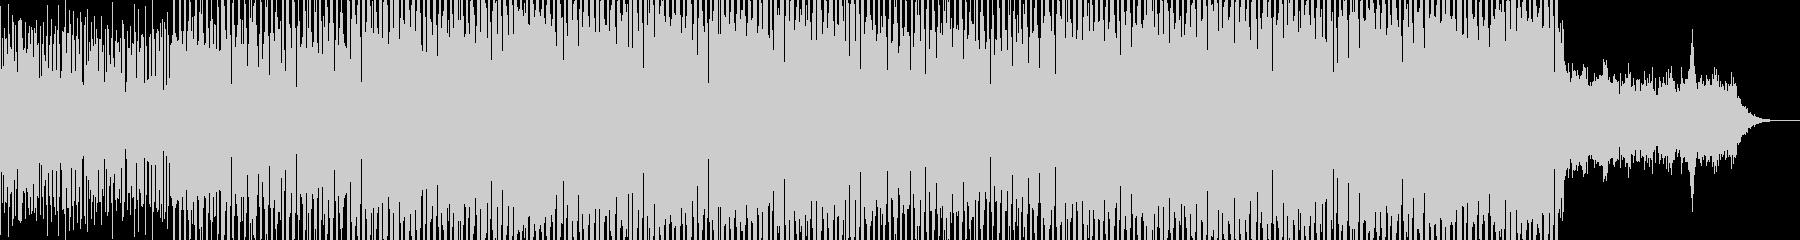 EDM明るいエスニック、クラブ系-10の未再生の波形